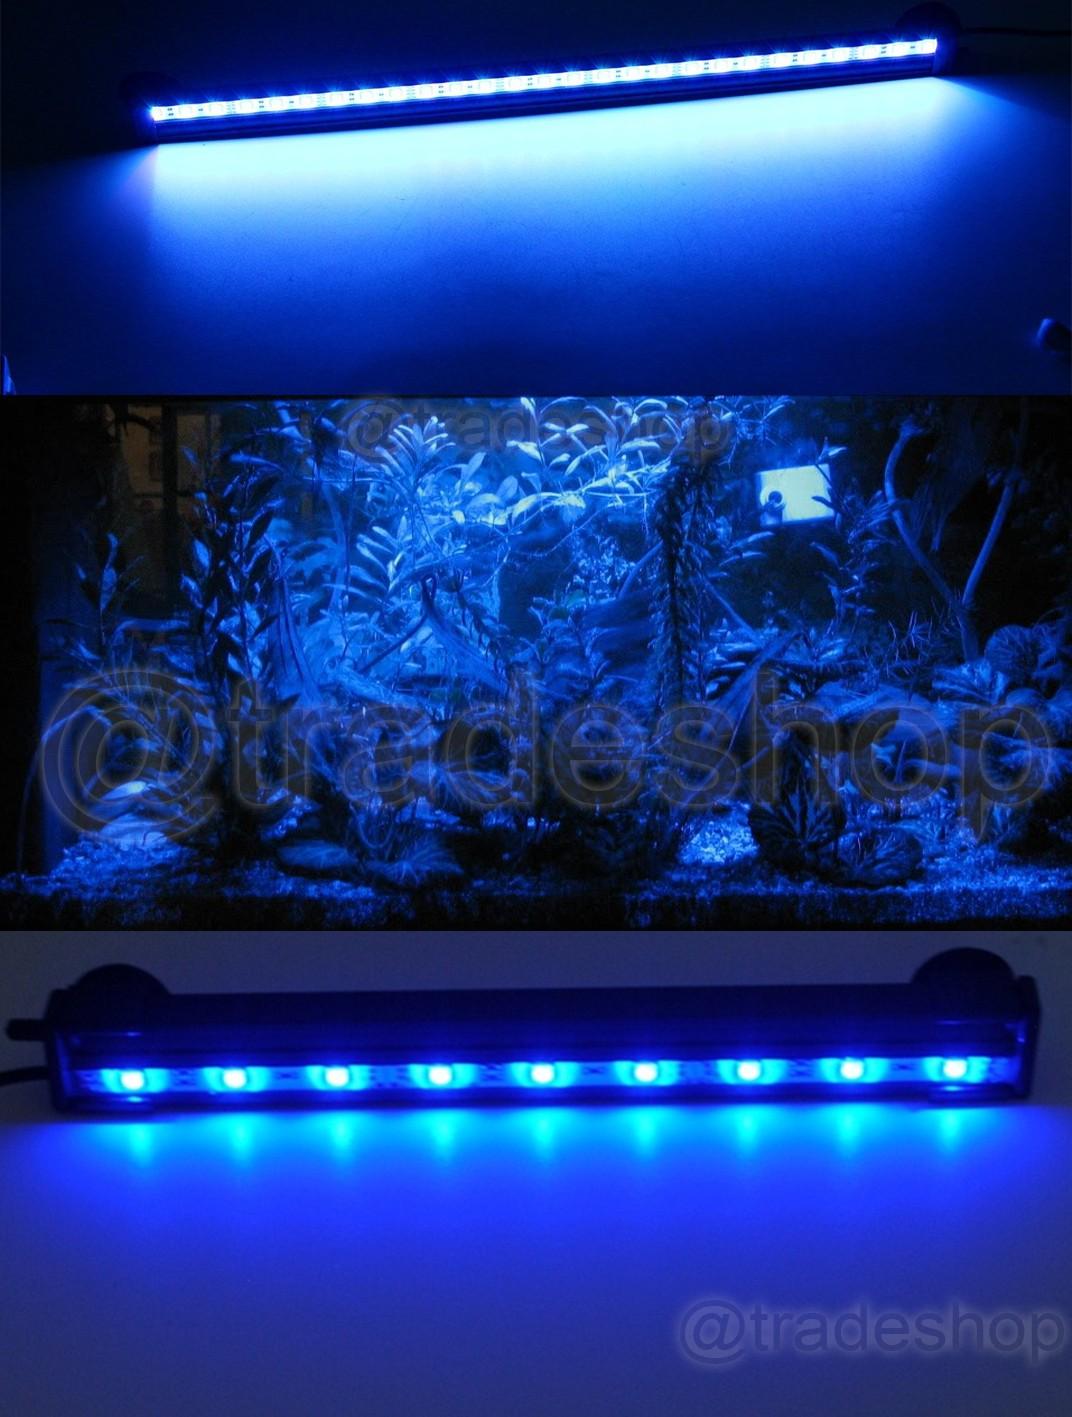 LAMPADA-IMMERSIONE-LED-PER-ACQUARIO-TUBO-LED-T4-DEE-LUCE-PESCI-BIANCA-RGB-BLU miniatura 4